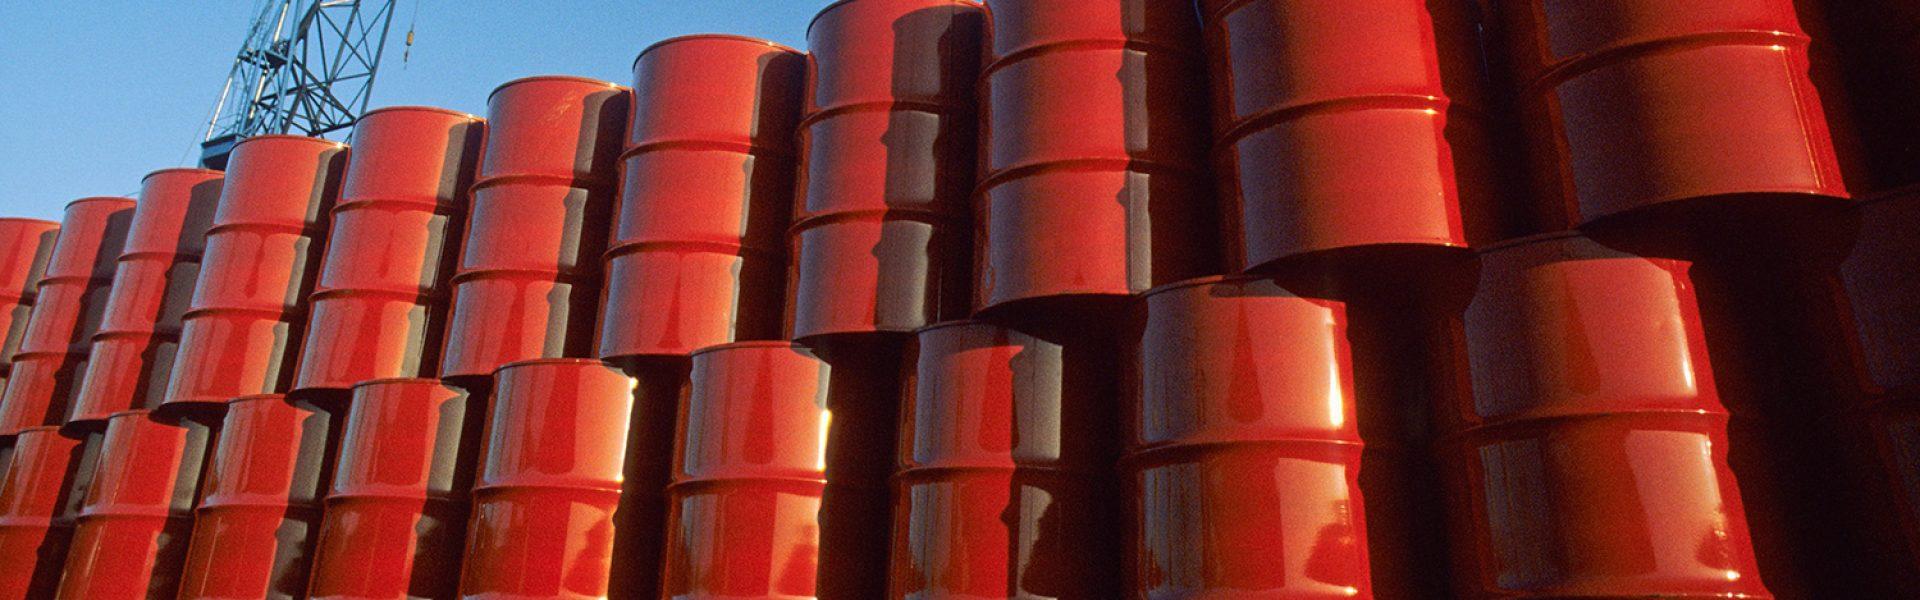 Helpful Waste Oil